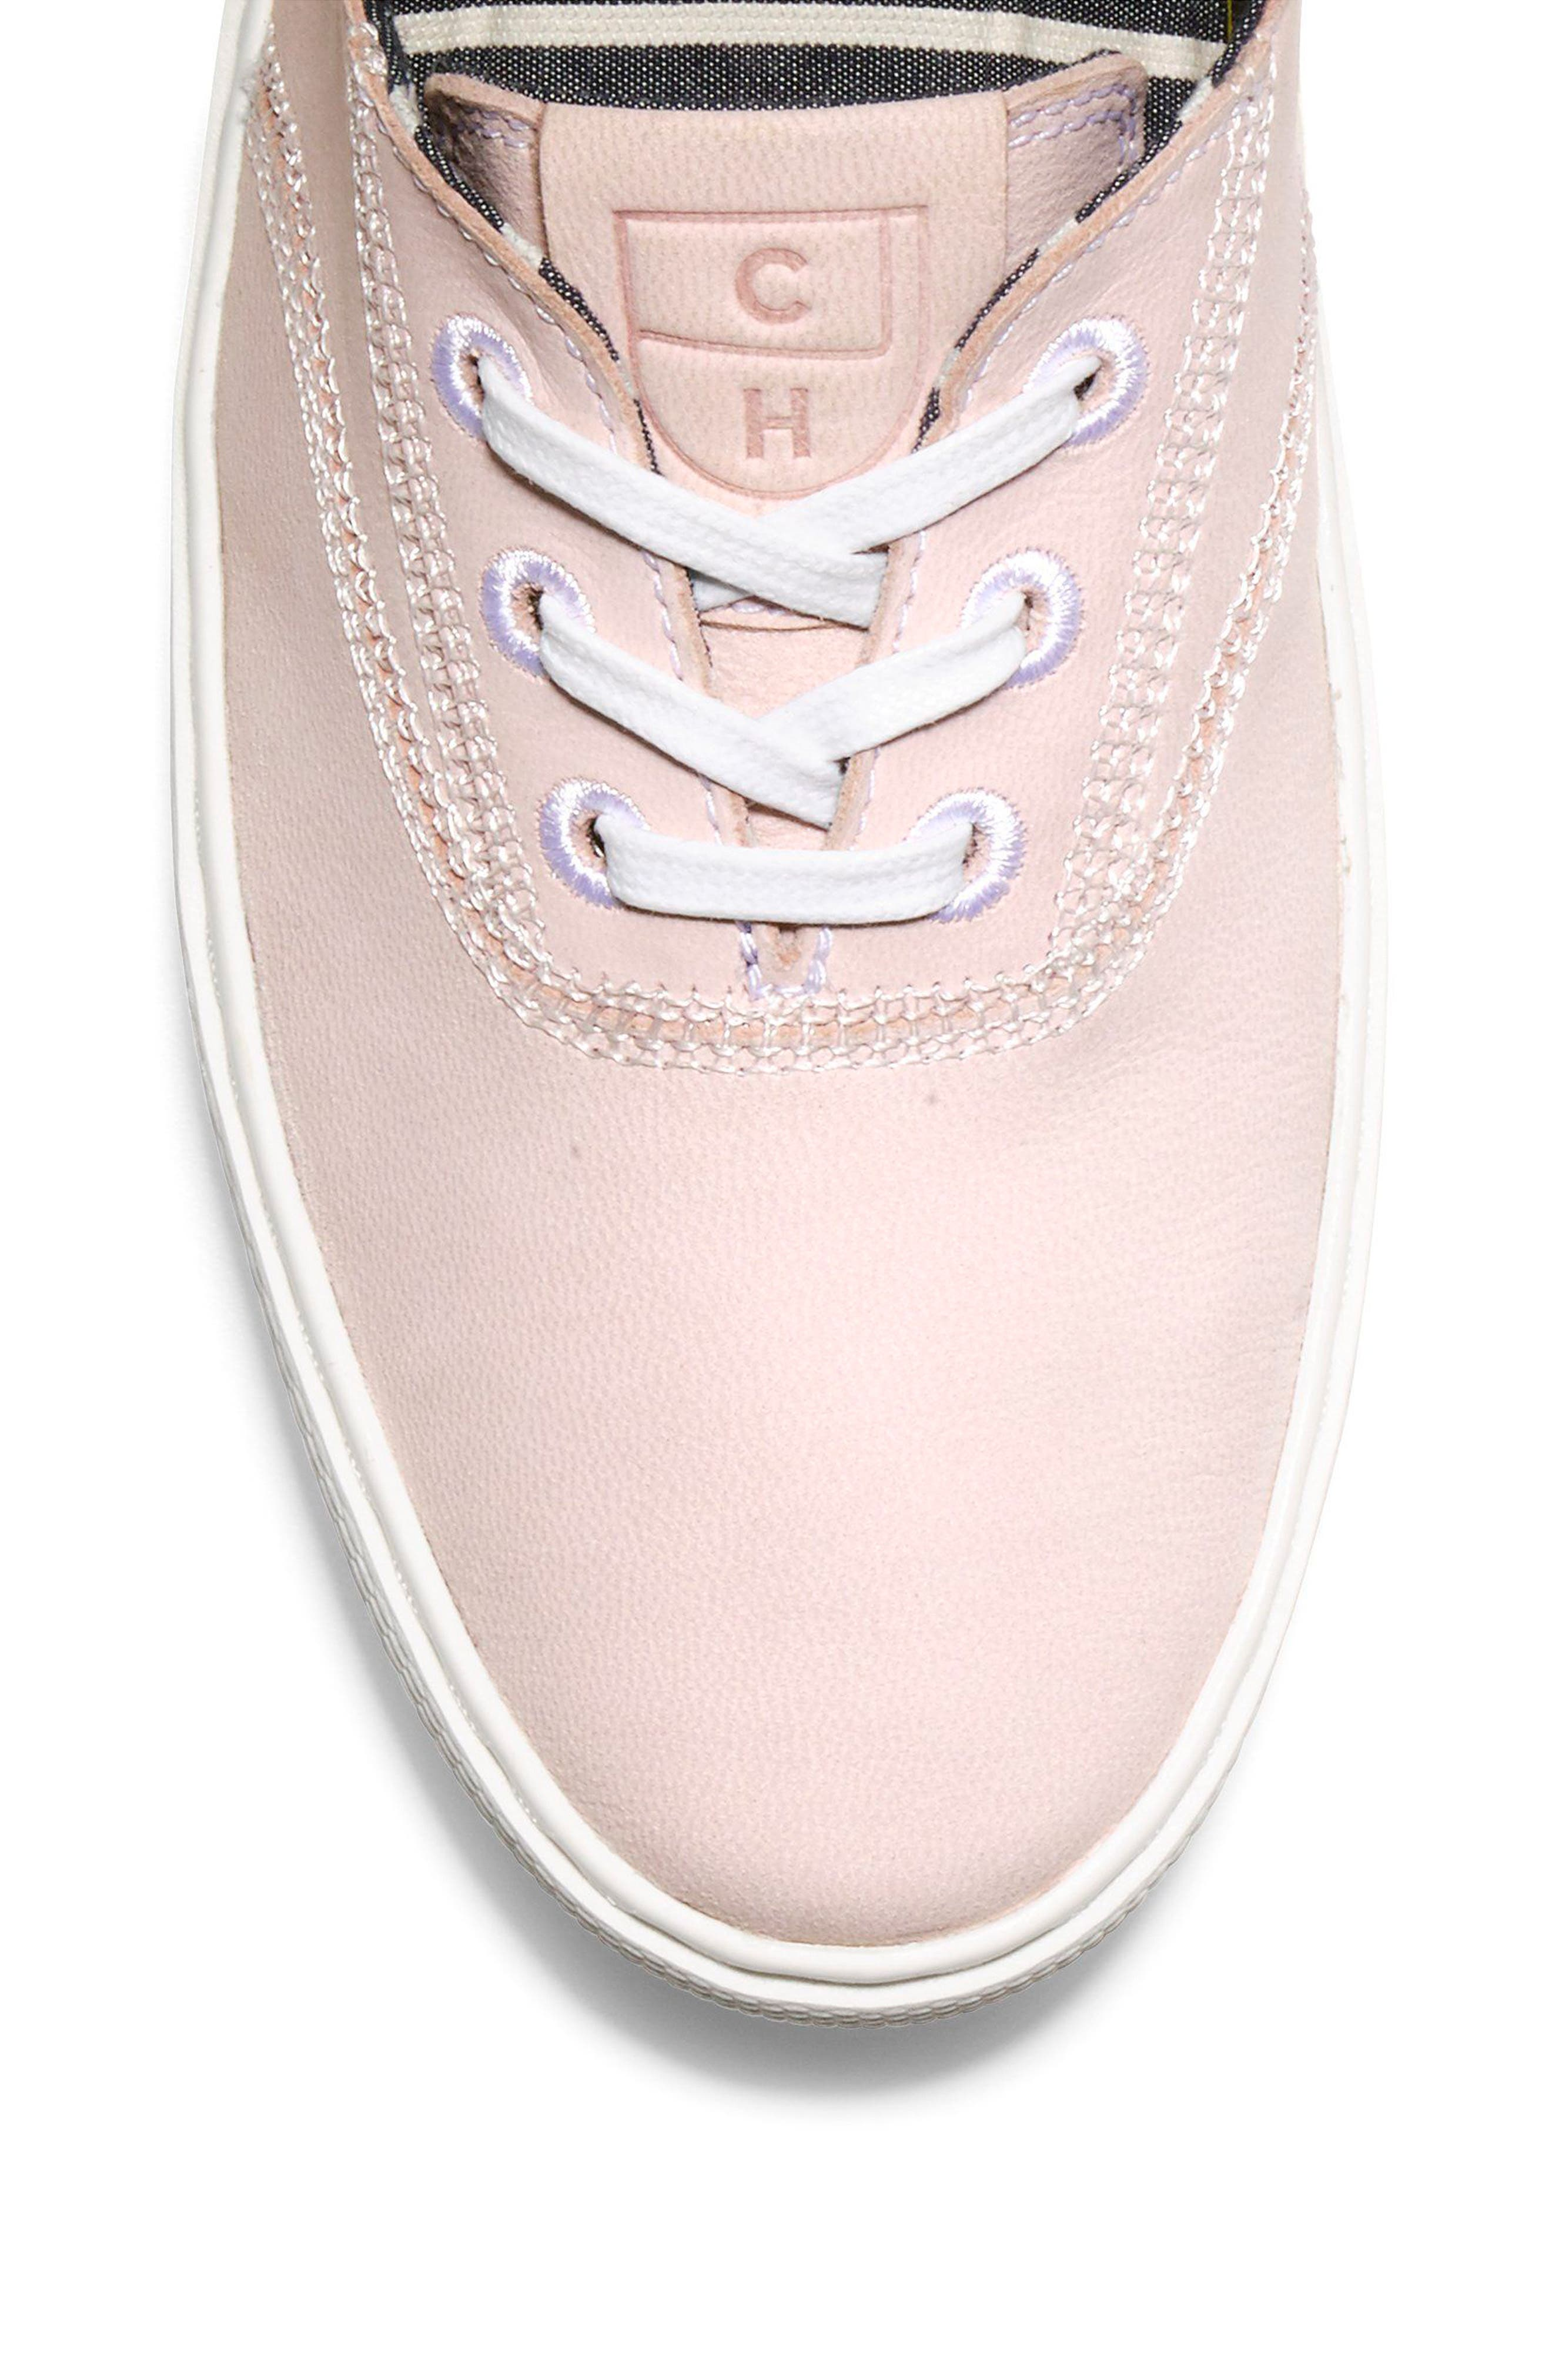 GrandPro Deck Sneaker,                             Alternate thumbnail 7, color,                             PETAL/ OPTIC WHITE NUBUCK